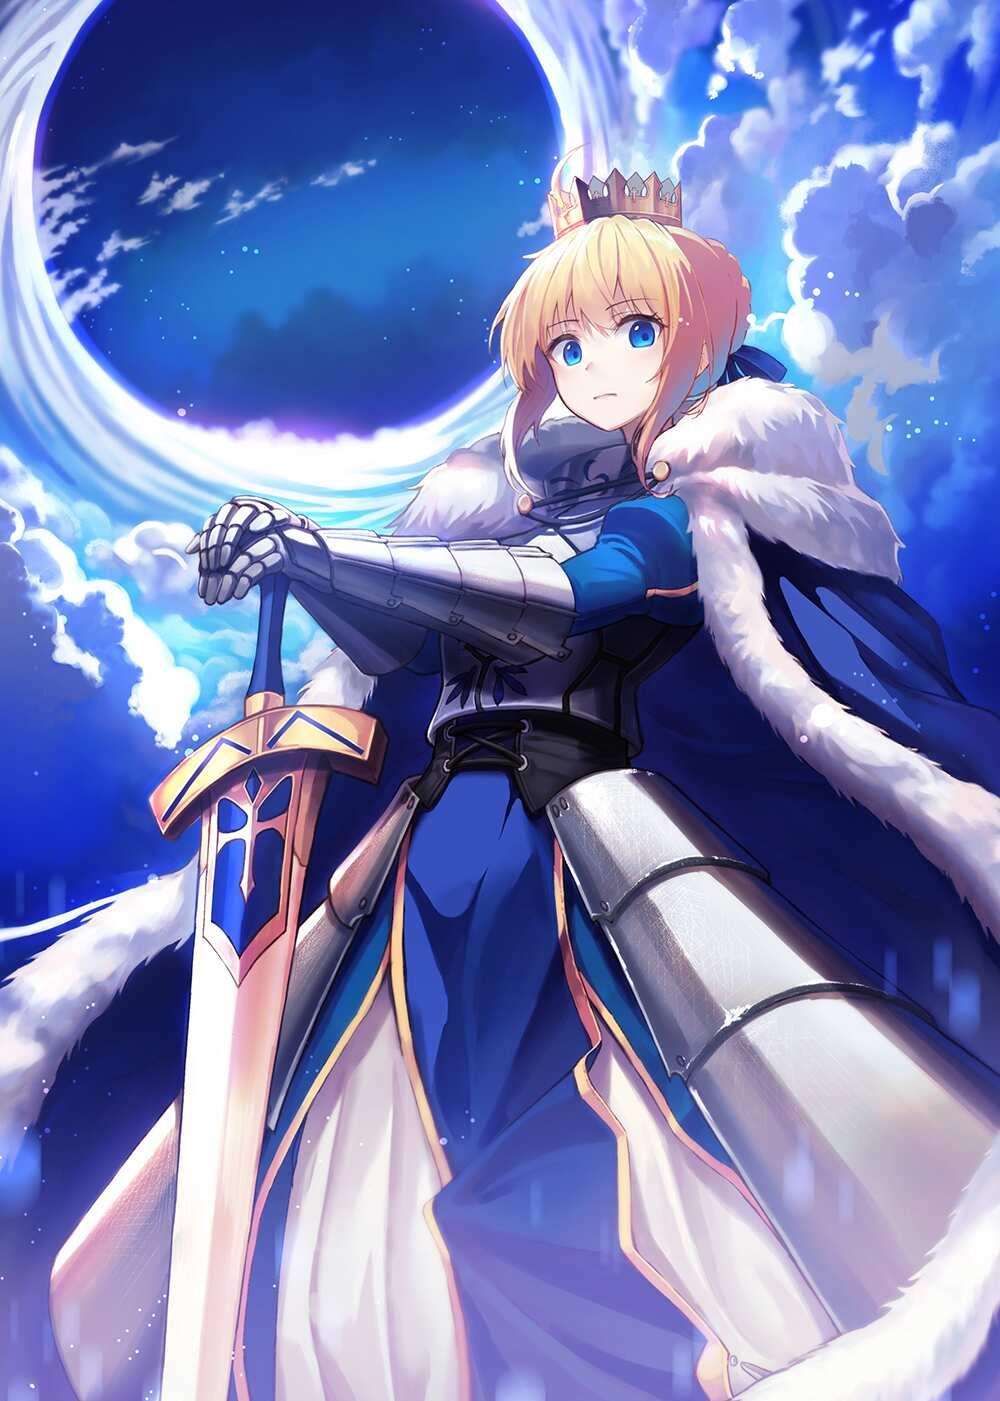 Anime female characters